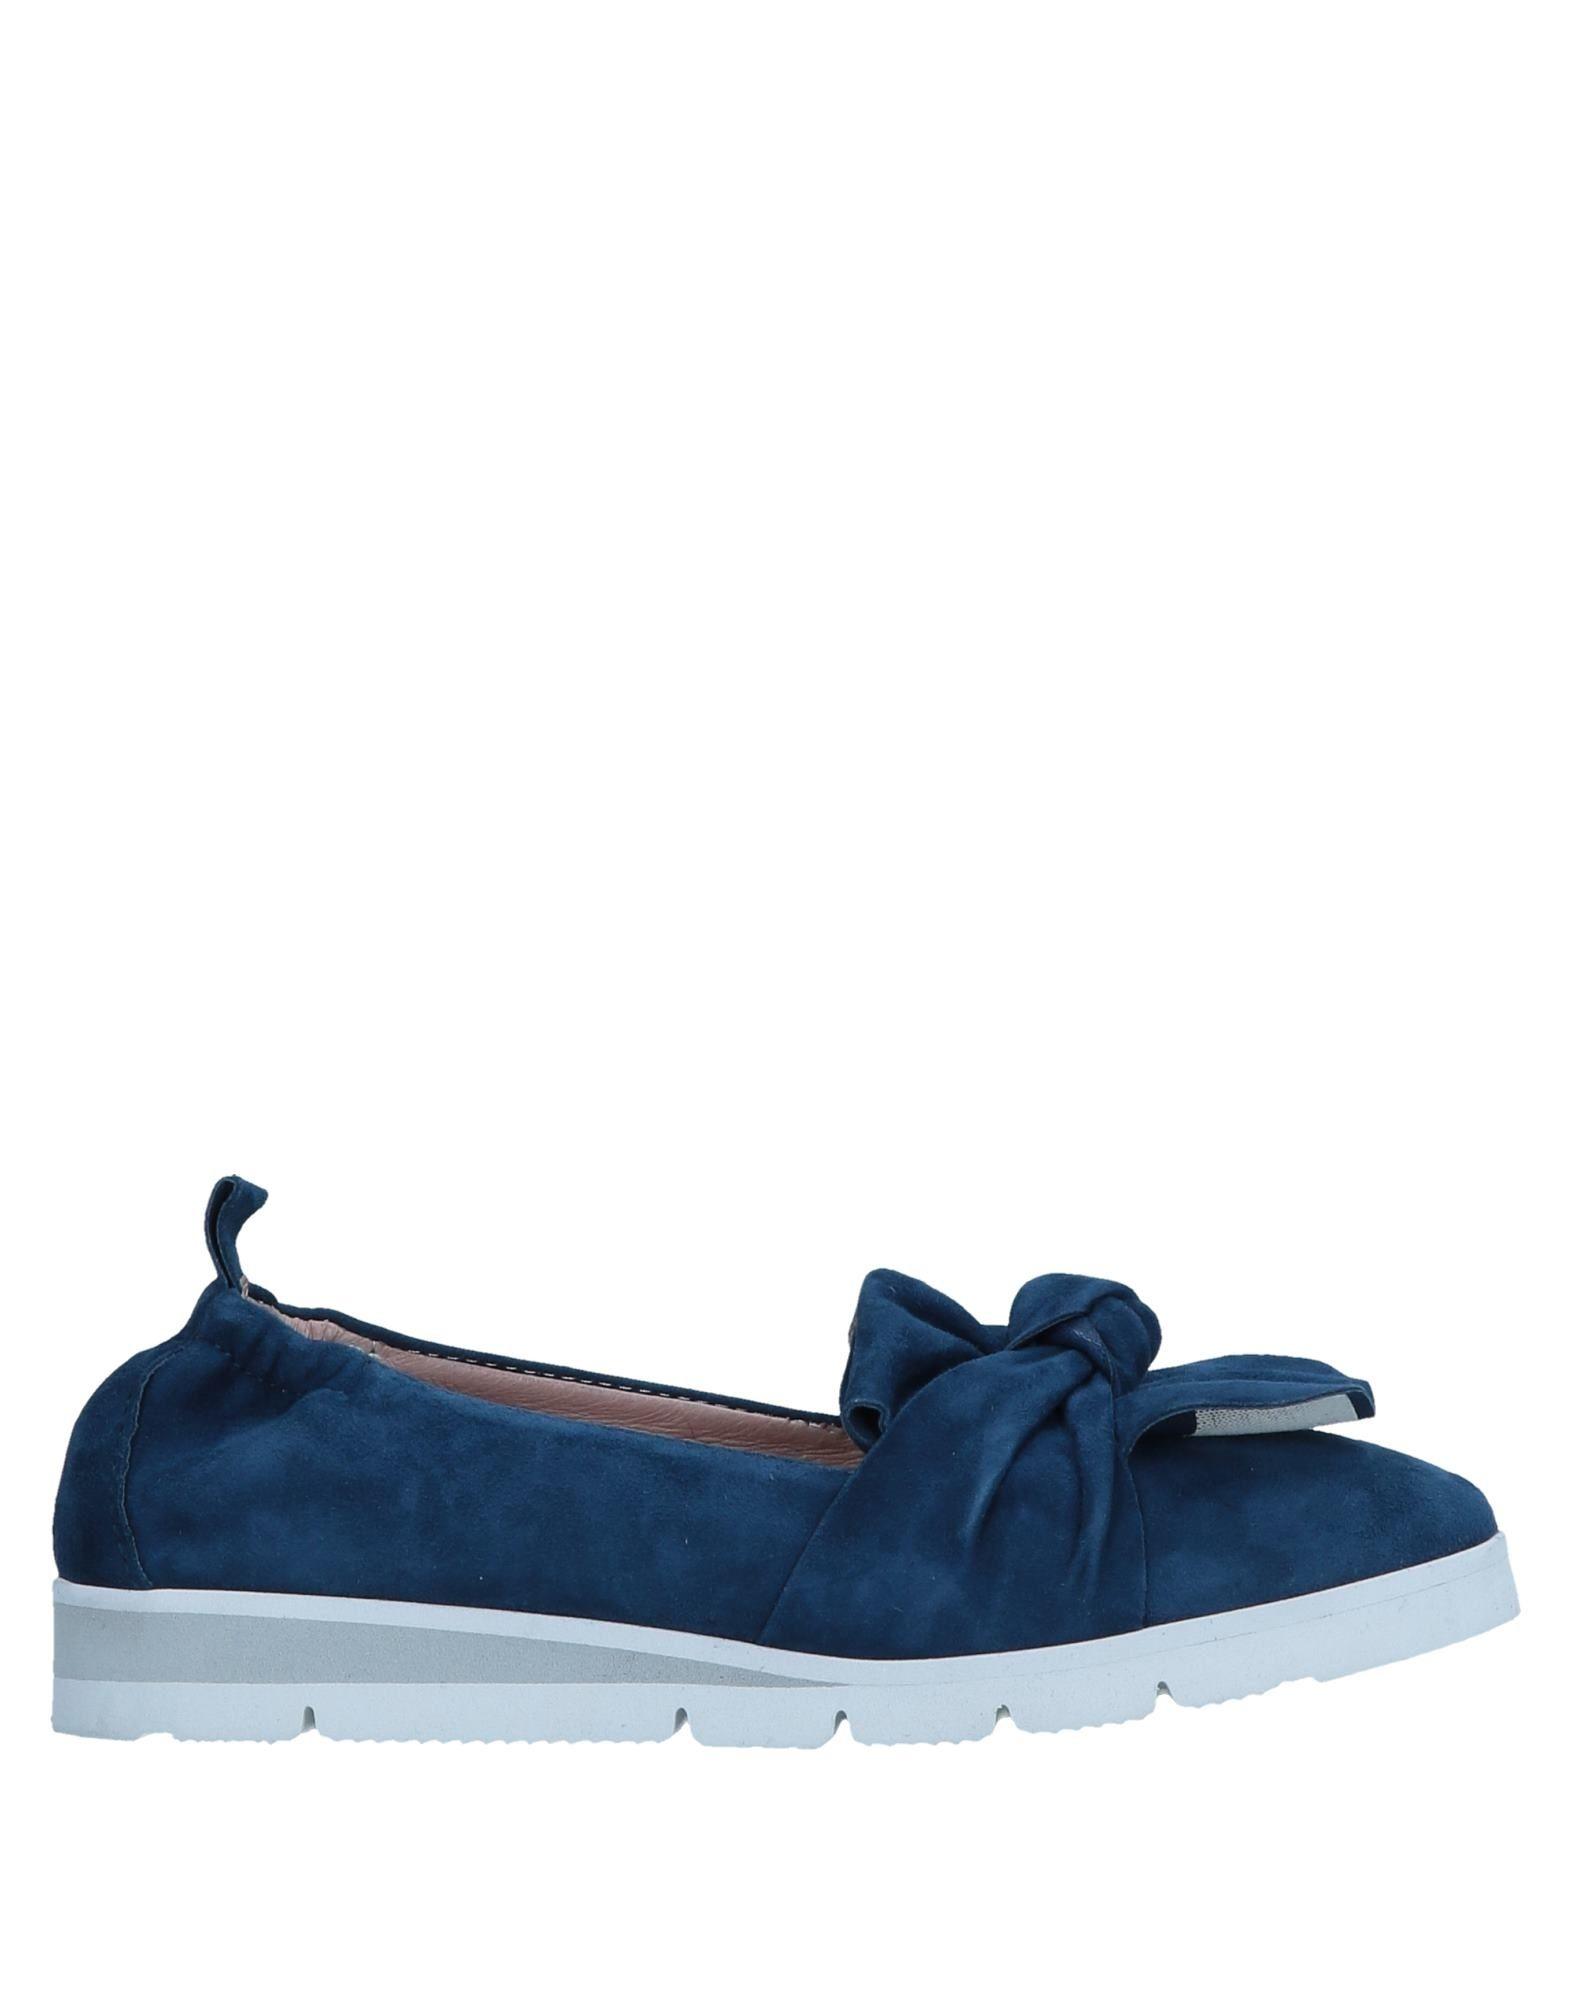 Barracuda's Collection Sneakers Damen  11557172OW Gute Qualität beliebte Schuhe